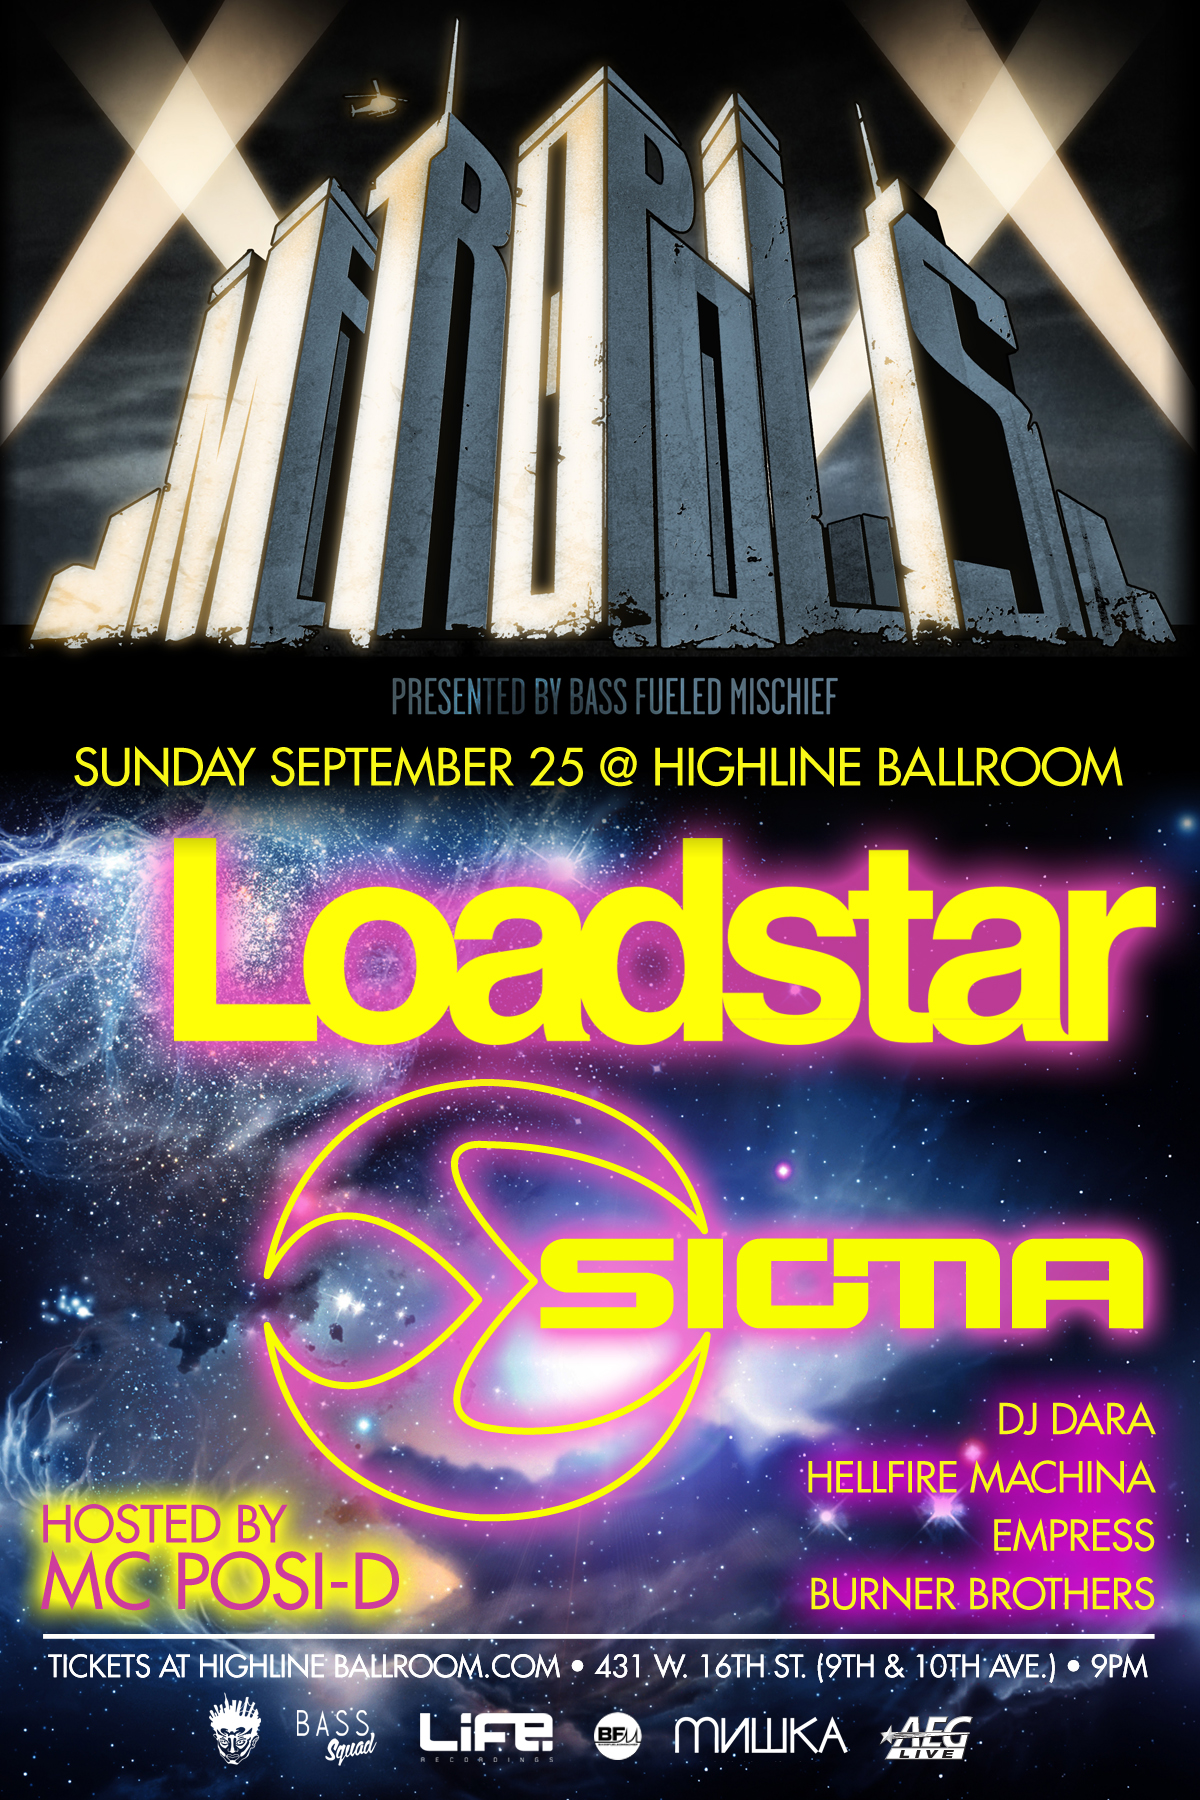 loadstar and sigma